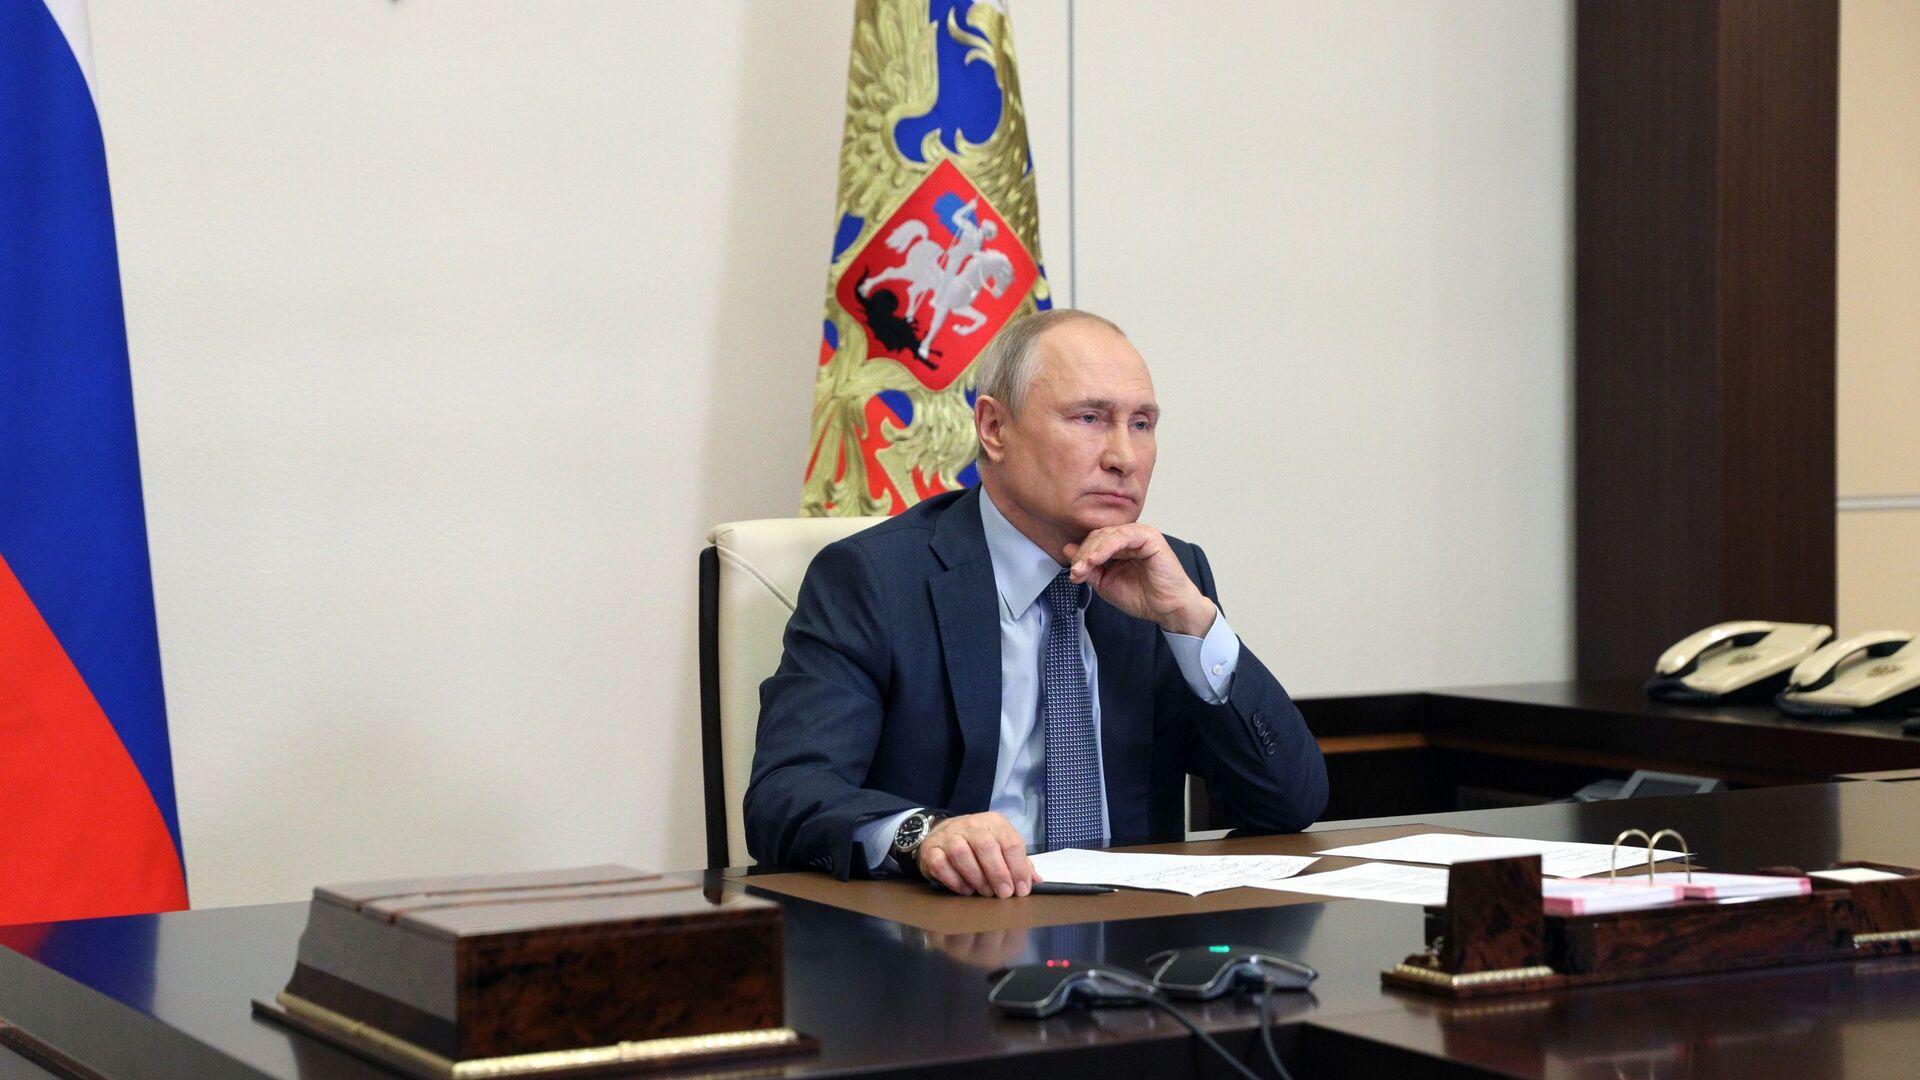 Tổng thống Nga Vladimir Putin. - Sputnik Việt Nam, 1920, 26.08.2021